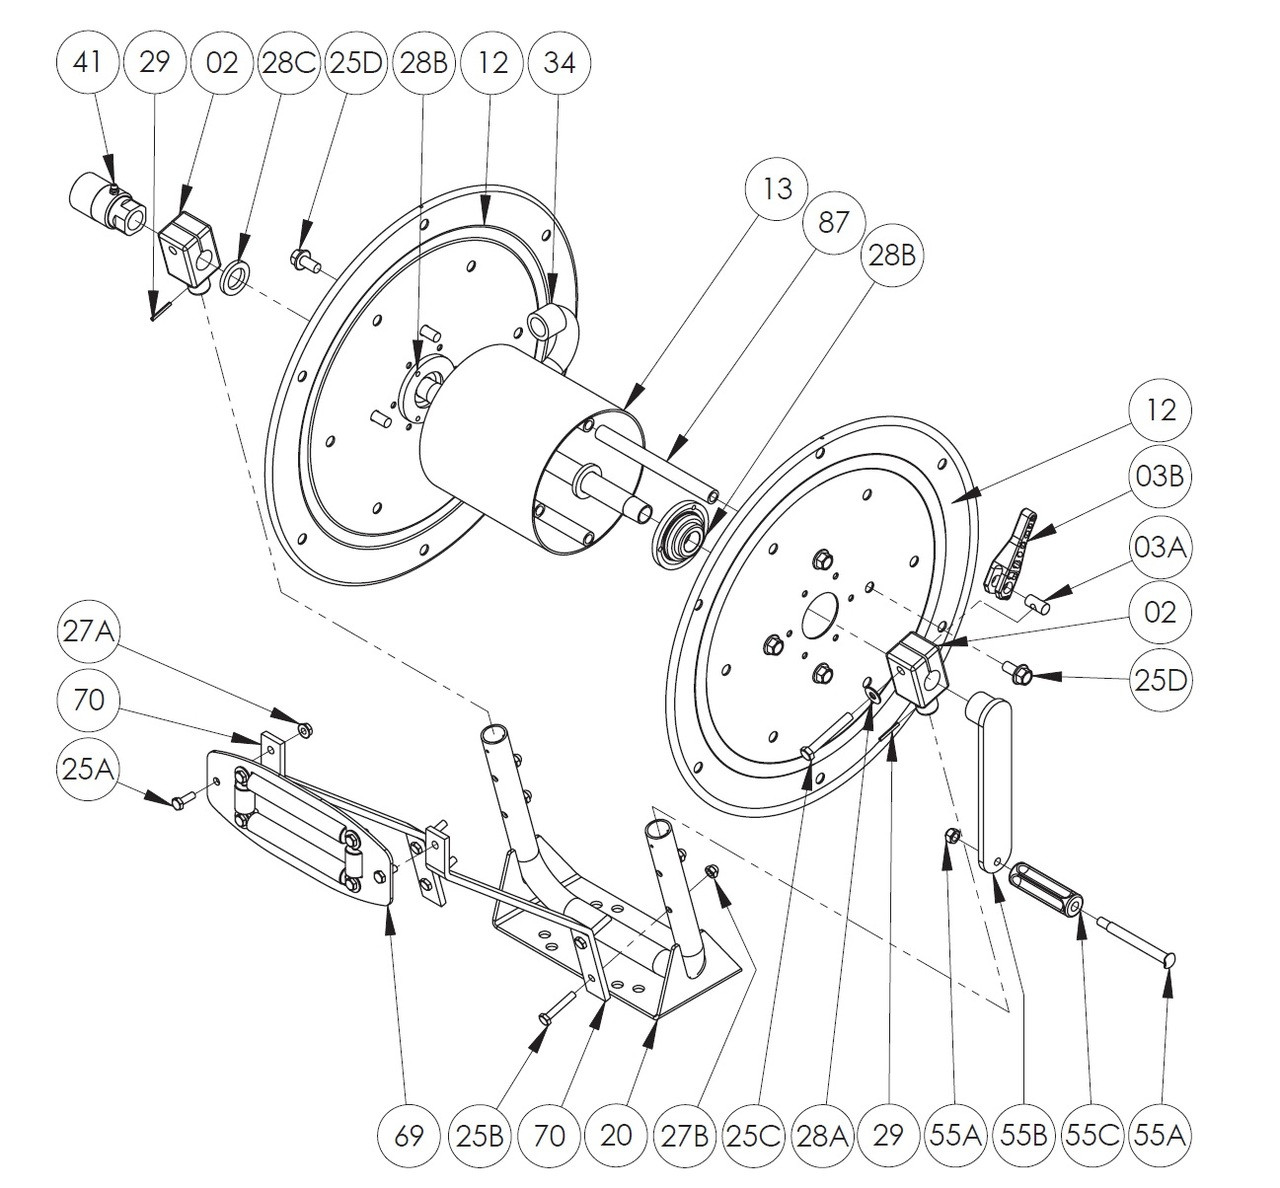 pw series pressure washer hose reel parts roller assy 69 john  pw series pressure washer hose reel parts roller assy 69 john m ellsworth co inc